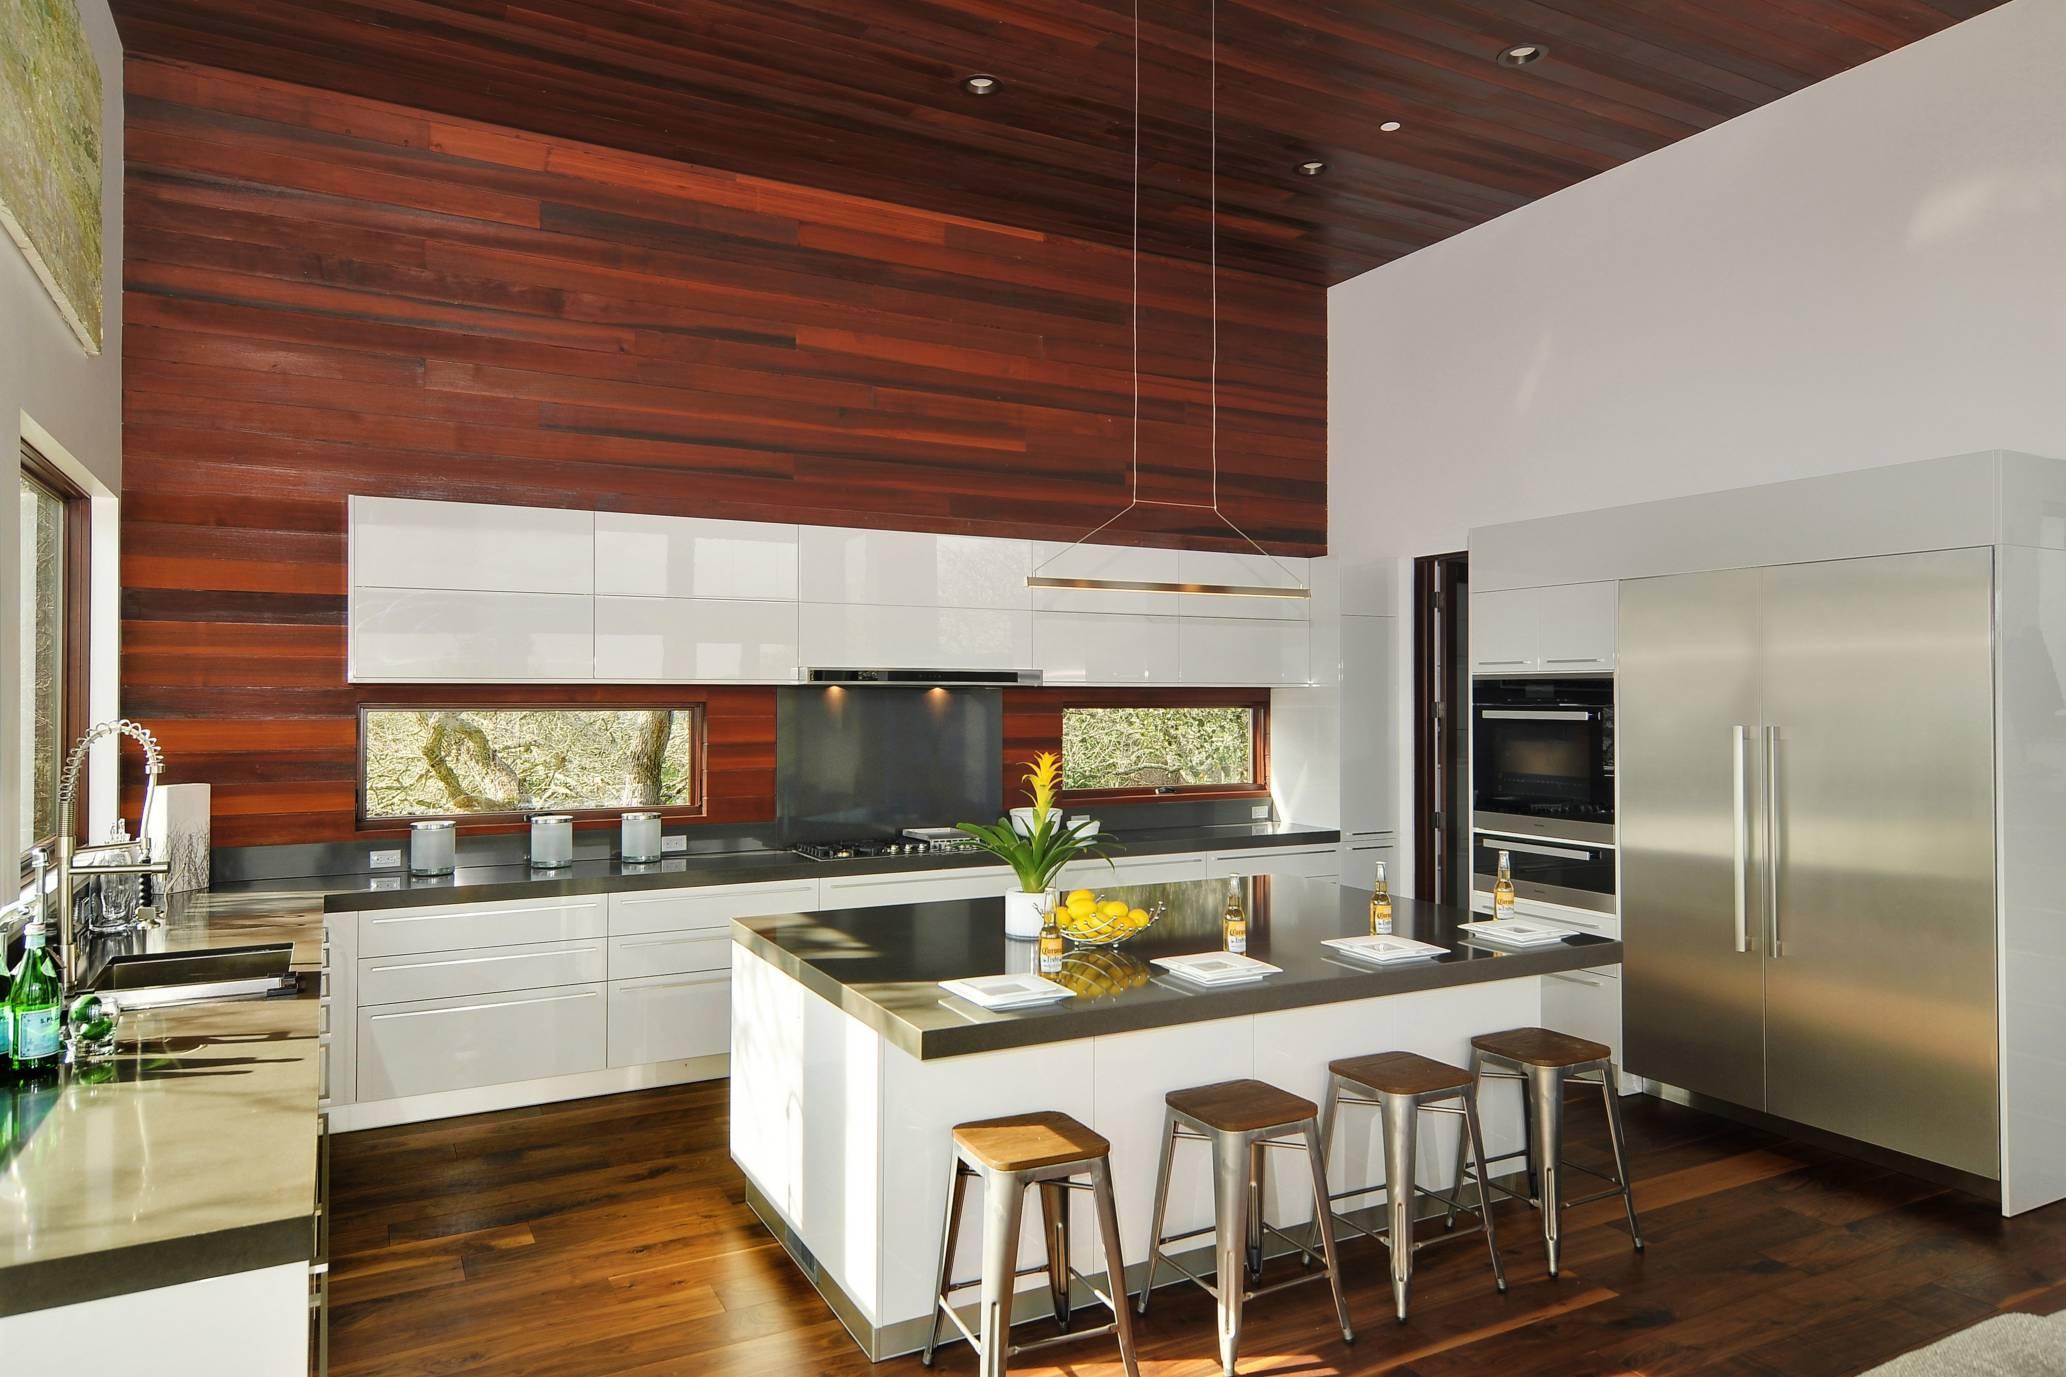 Modern kitchen bar stools grey countertops